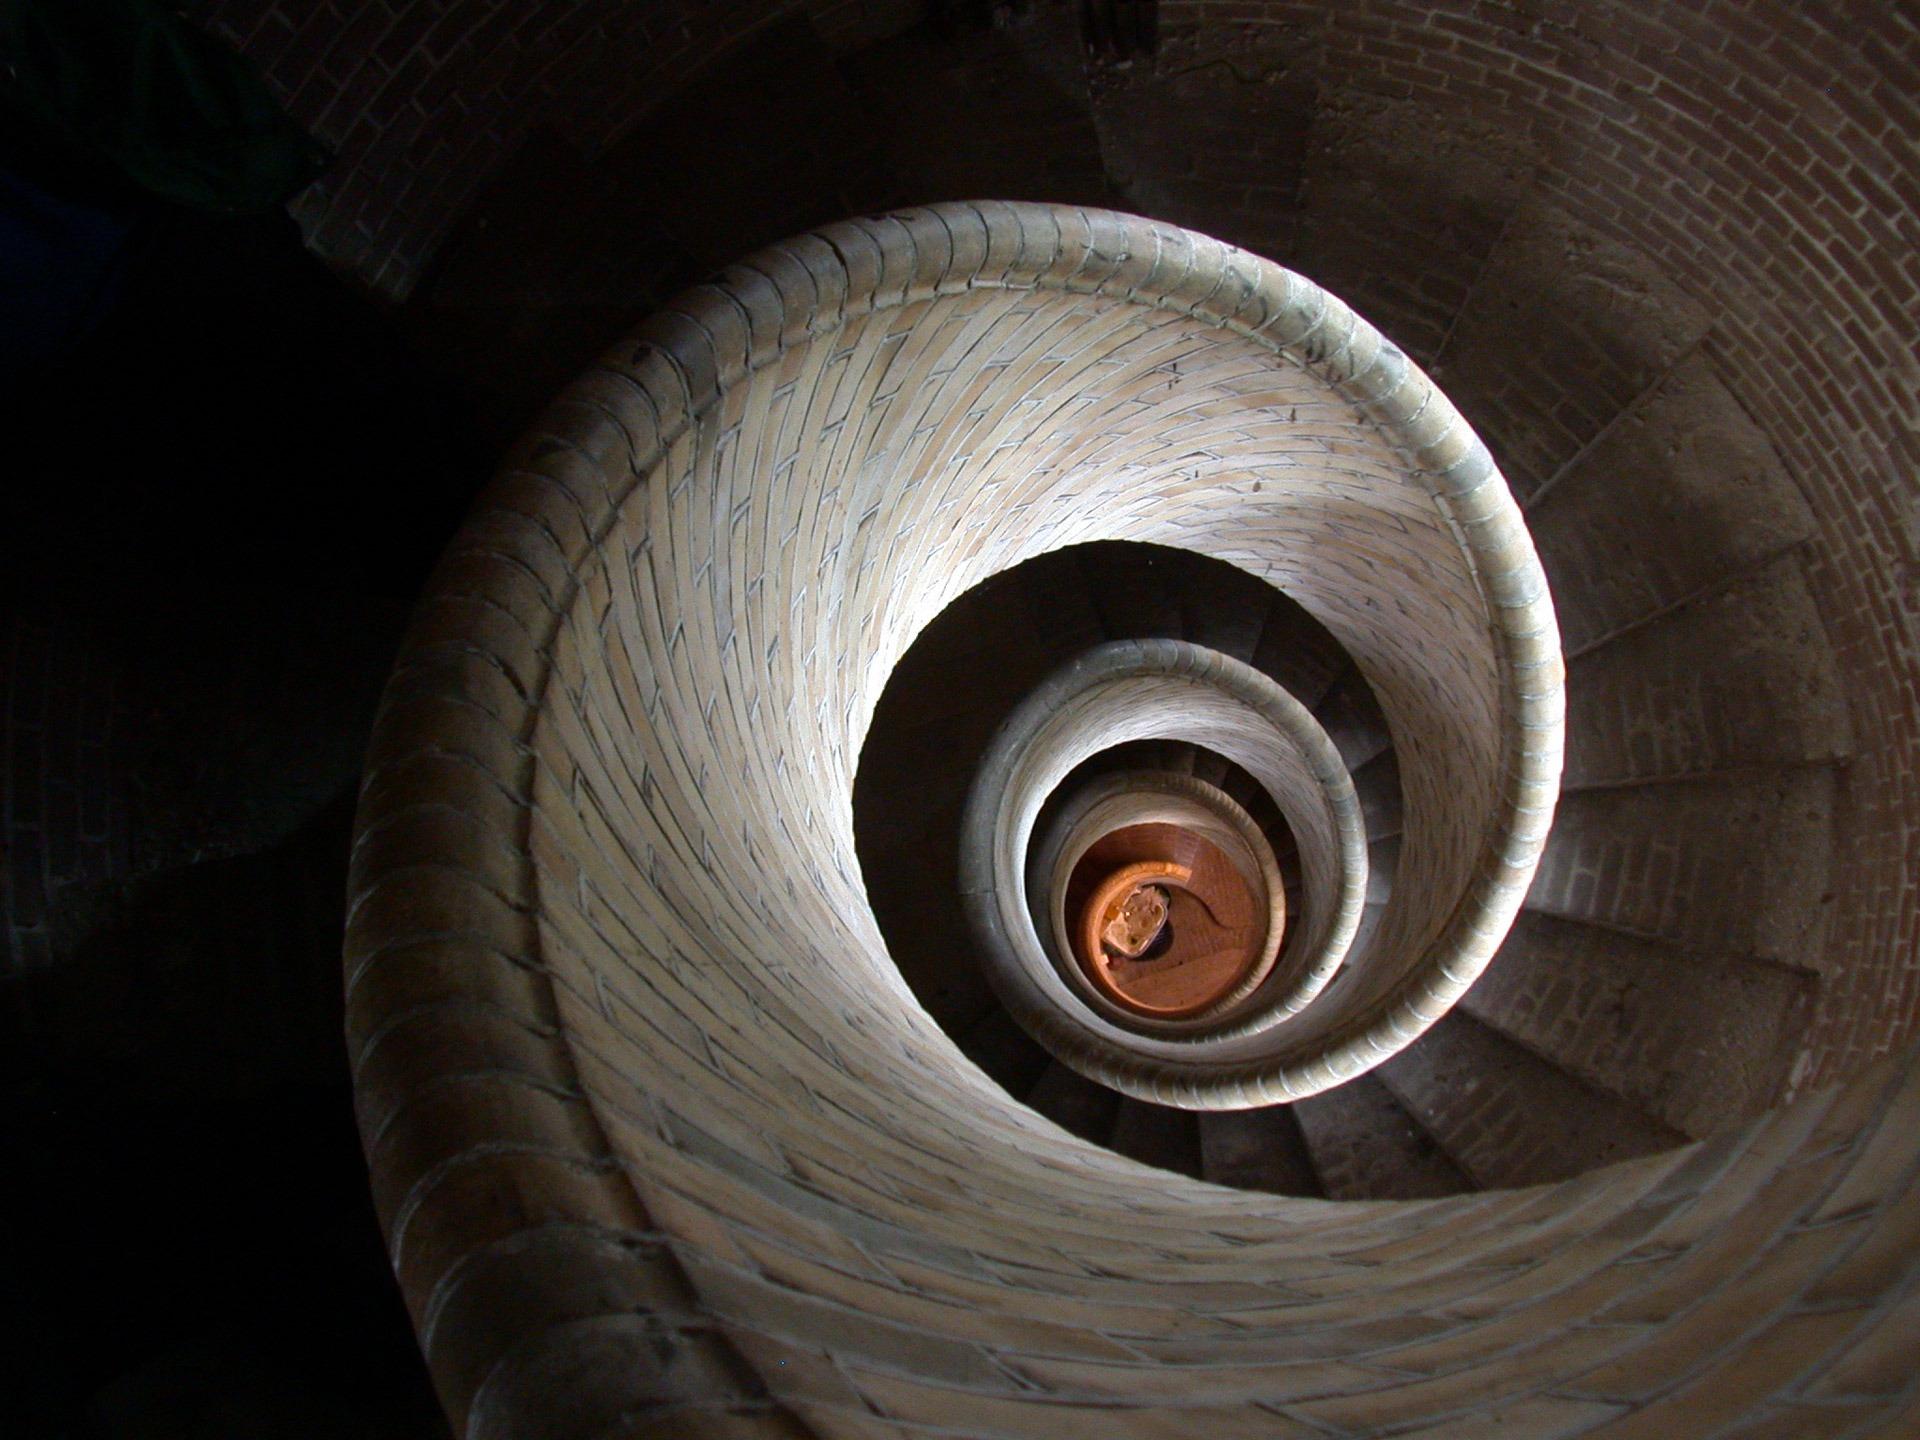 Fotos gratis arquitectura madera rueda espiral for Escalera de madera 5 pasos